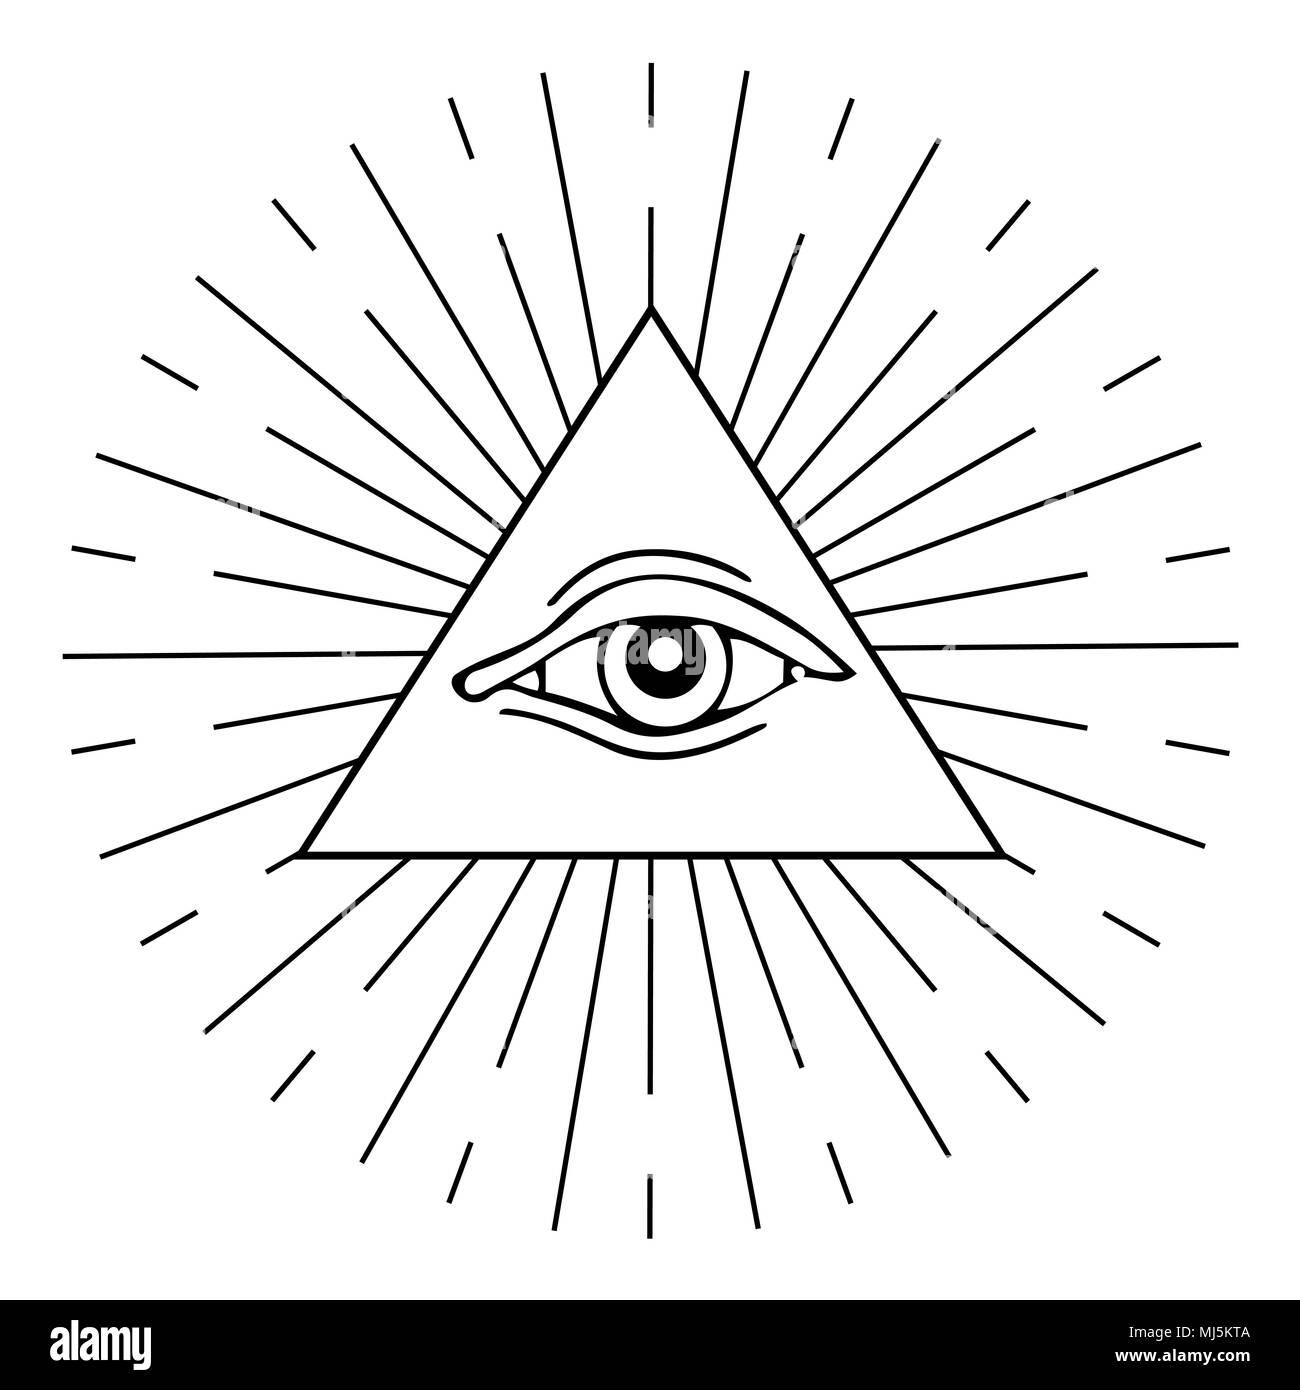 Eye Of Providence Masonic And Esoteric Symbol Stock Vector Art